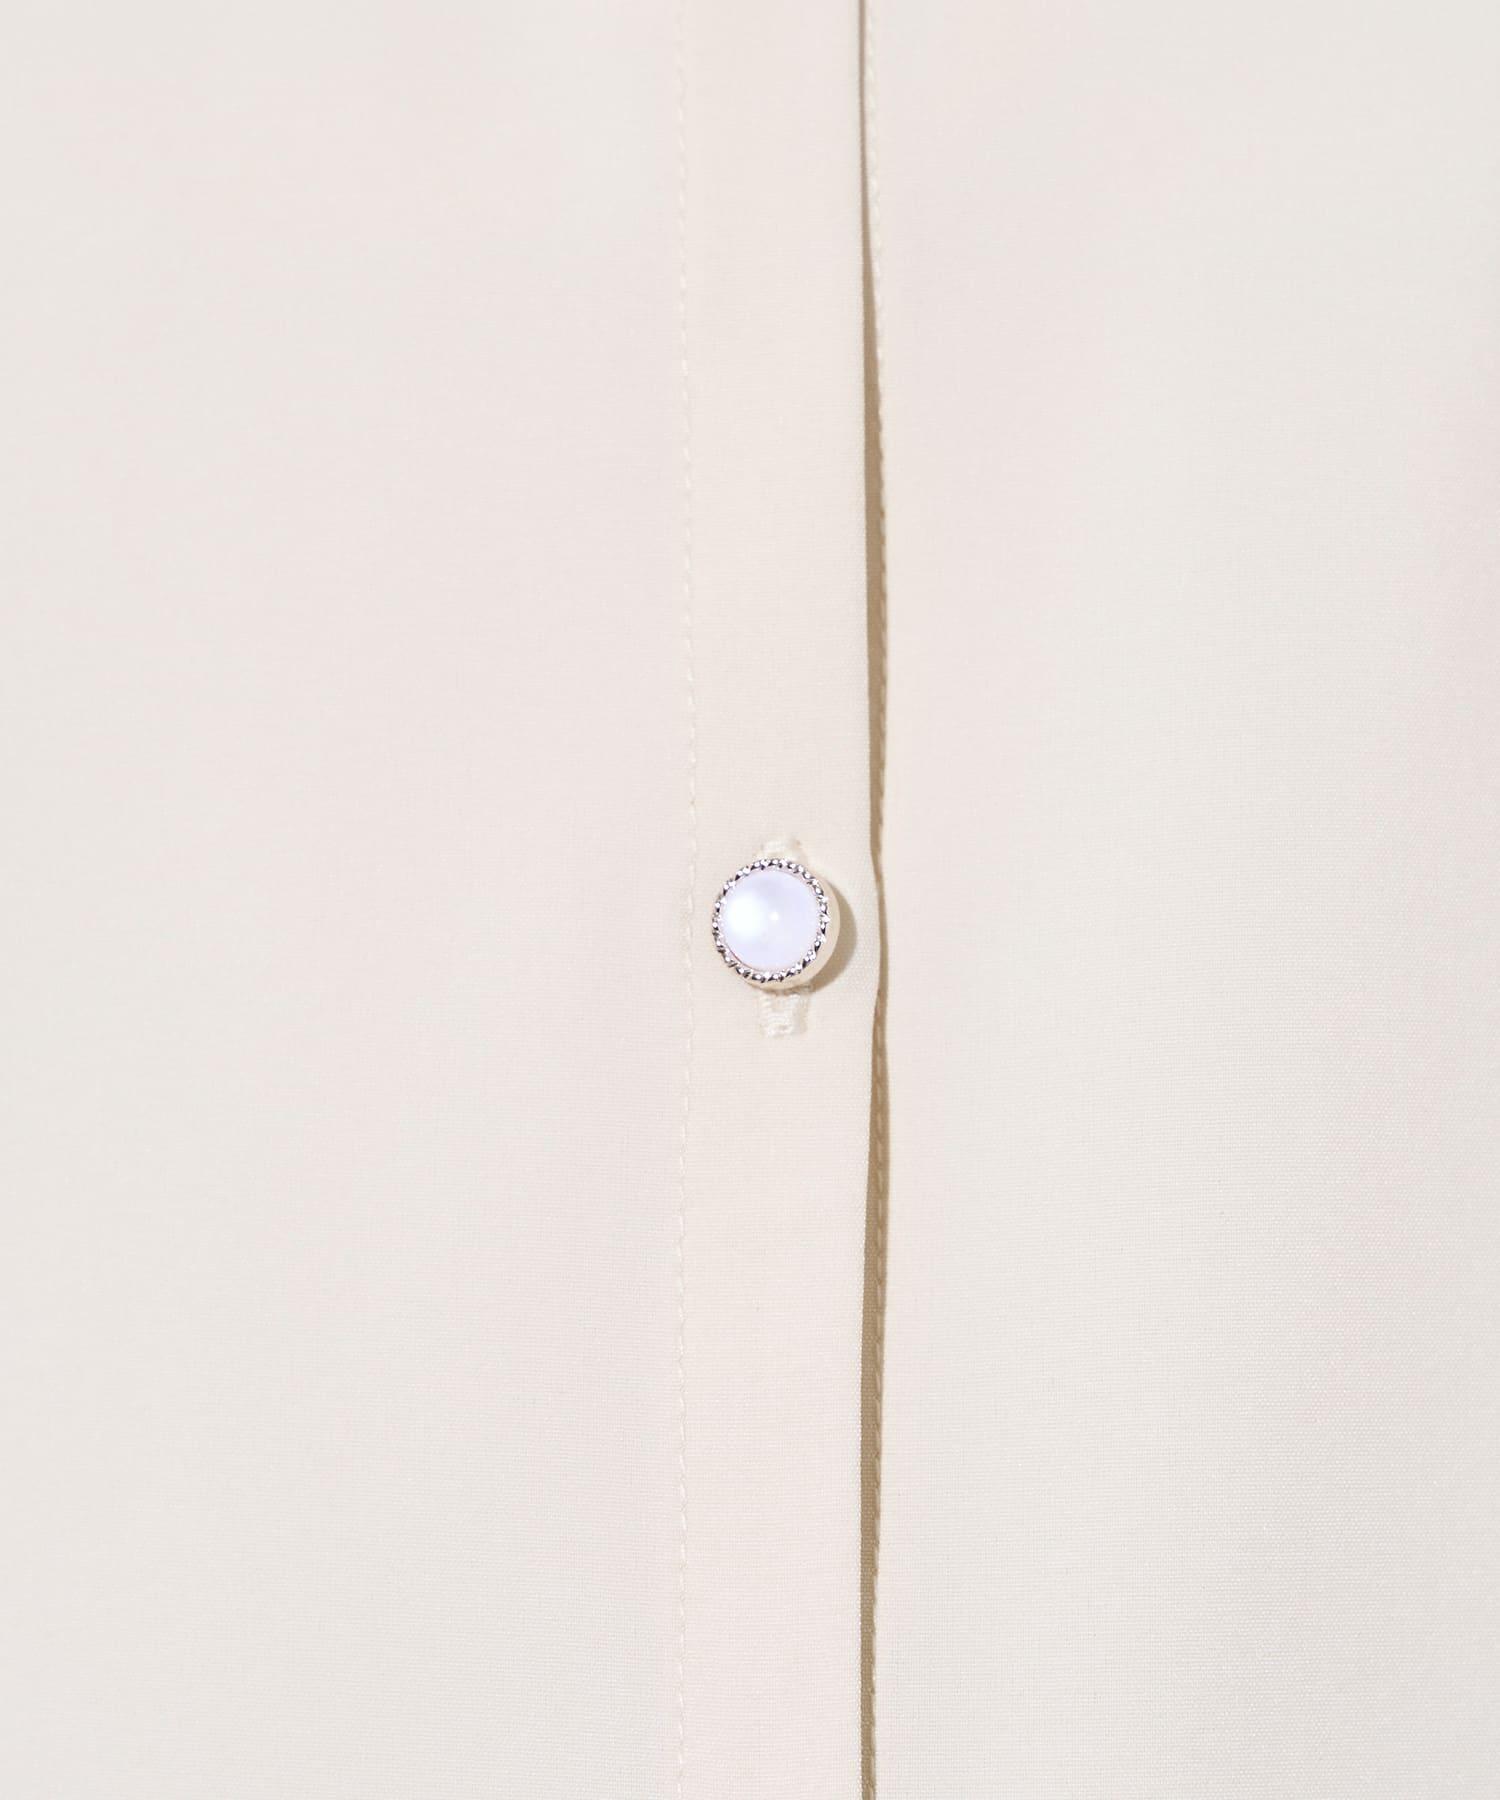 OLIVE des OLIVE(オリーブ デ オリーブ) ボウタイ衿レース5分袖ブラウス